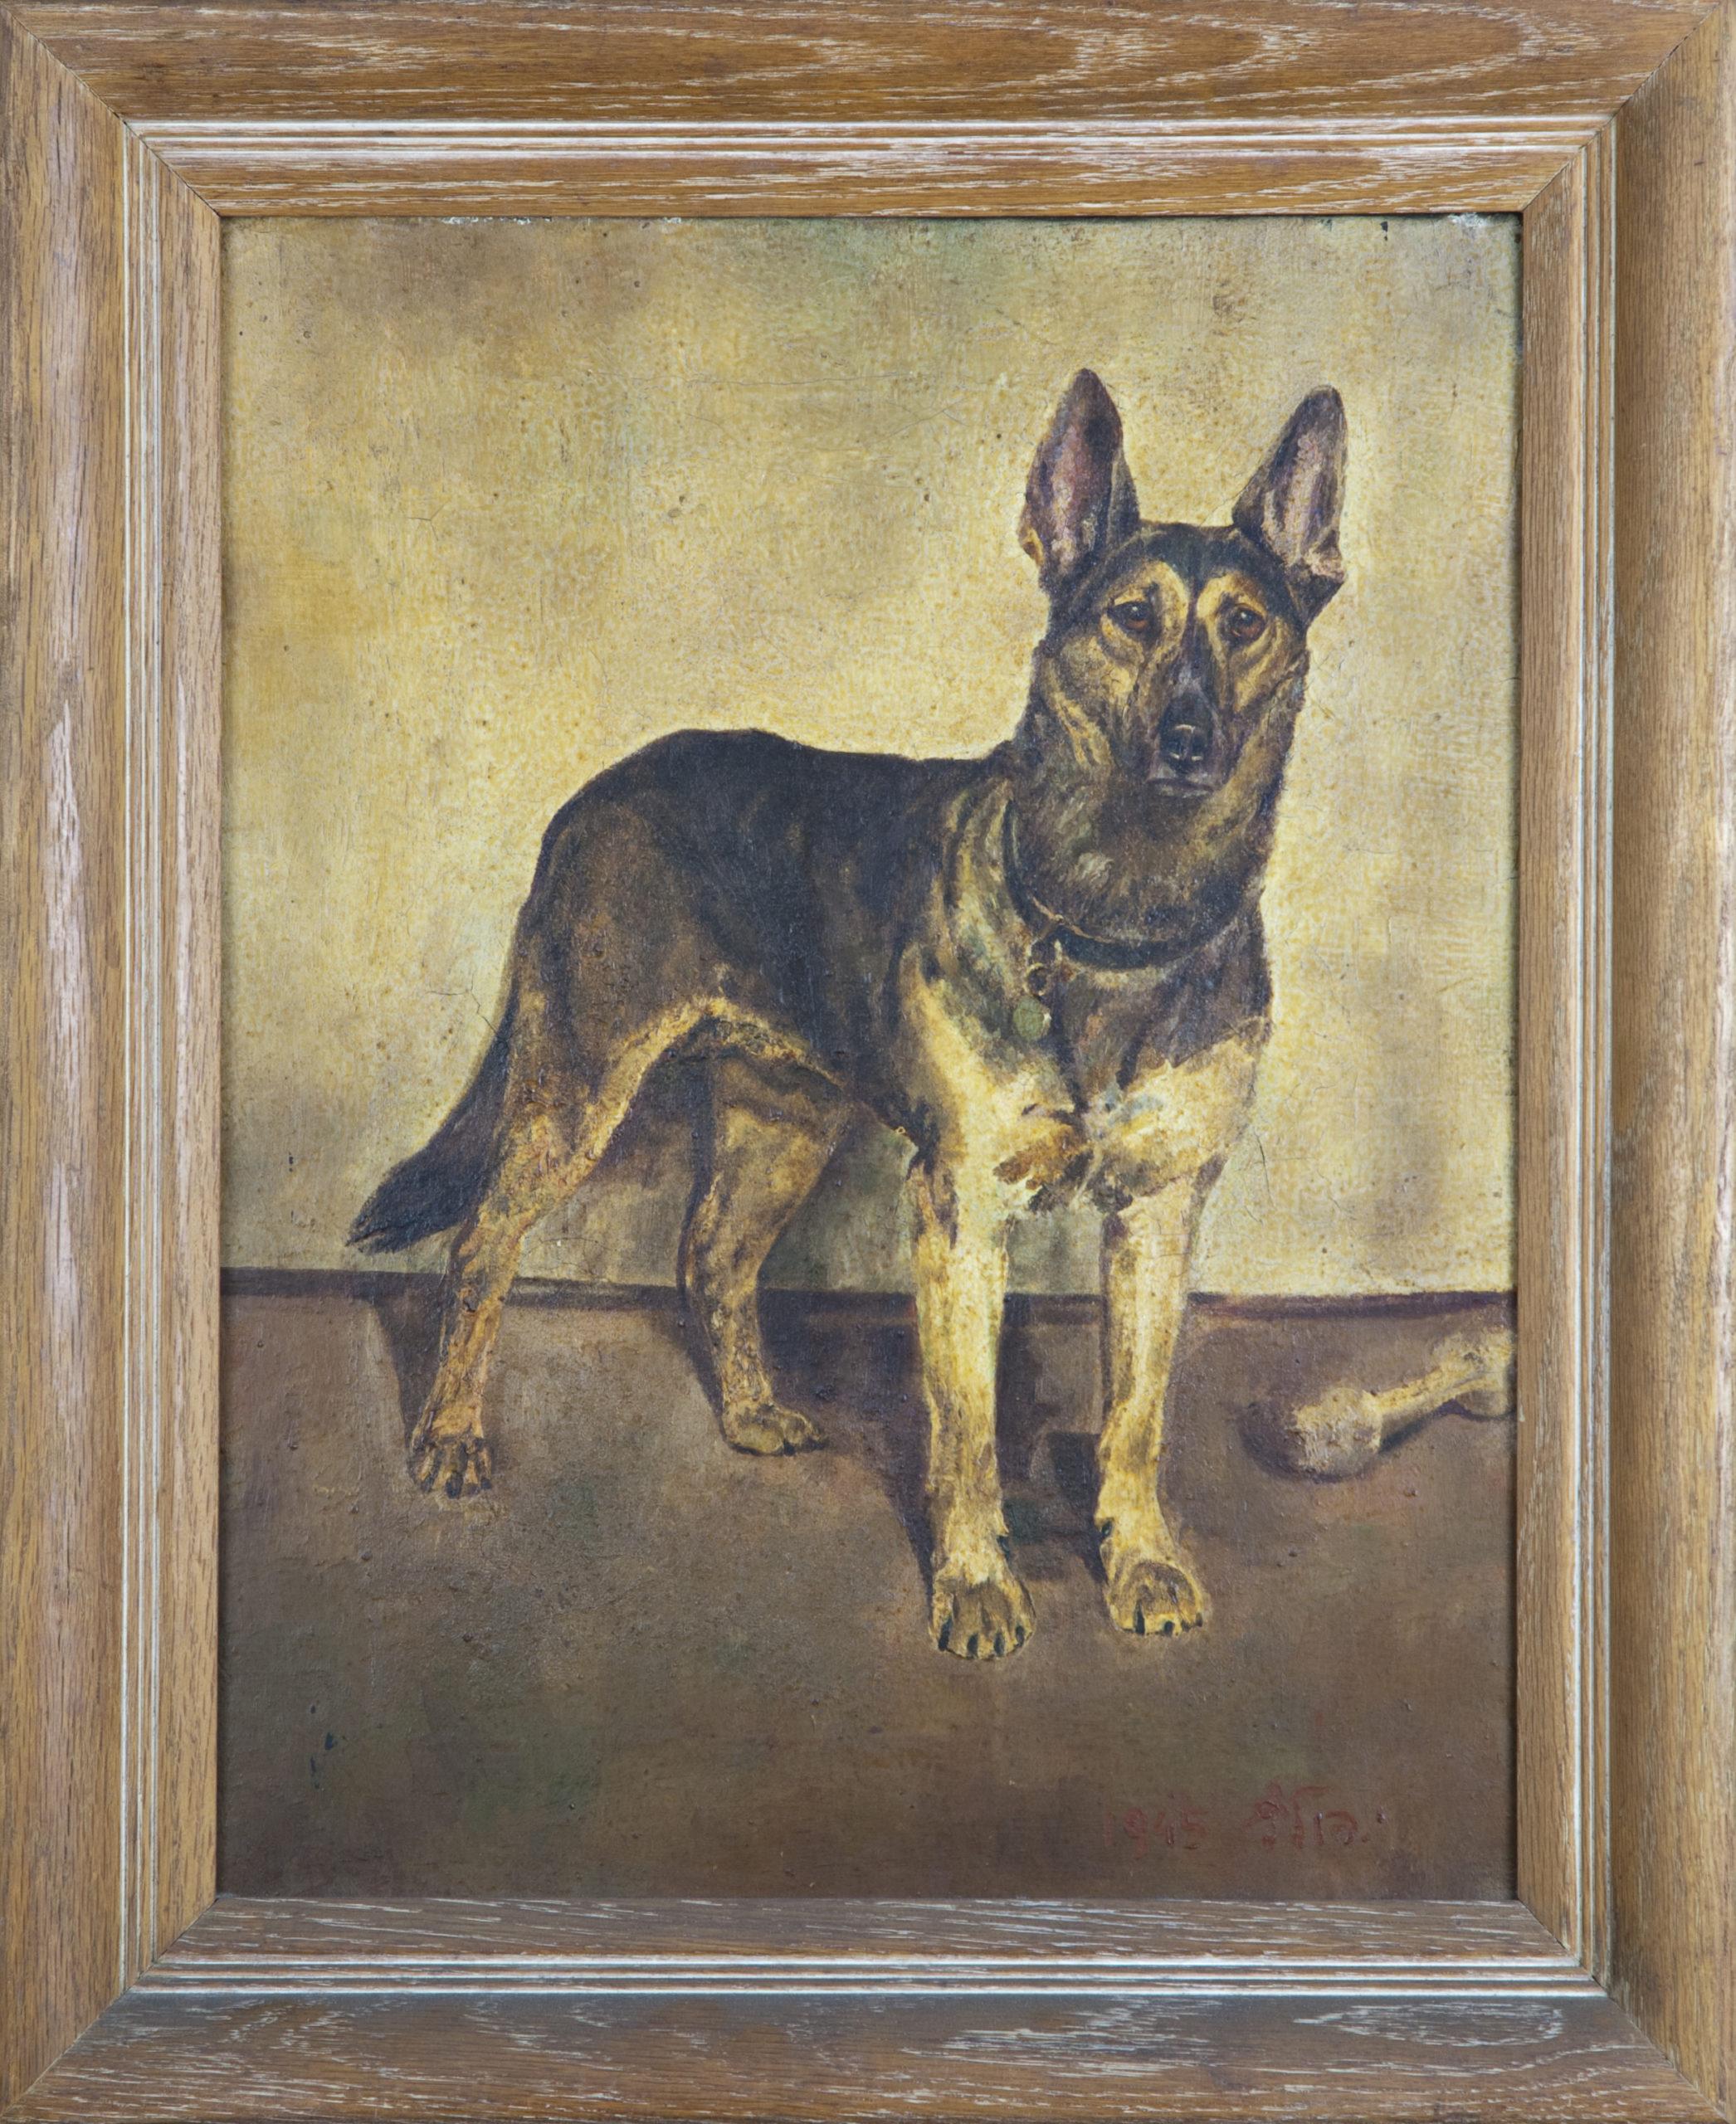 265 German Shepherd 1945 - Oil on Canvas - 14 x 18 - Frame: 18 x 22 x 2